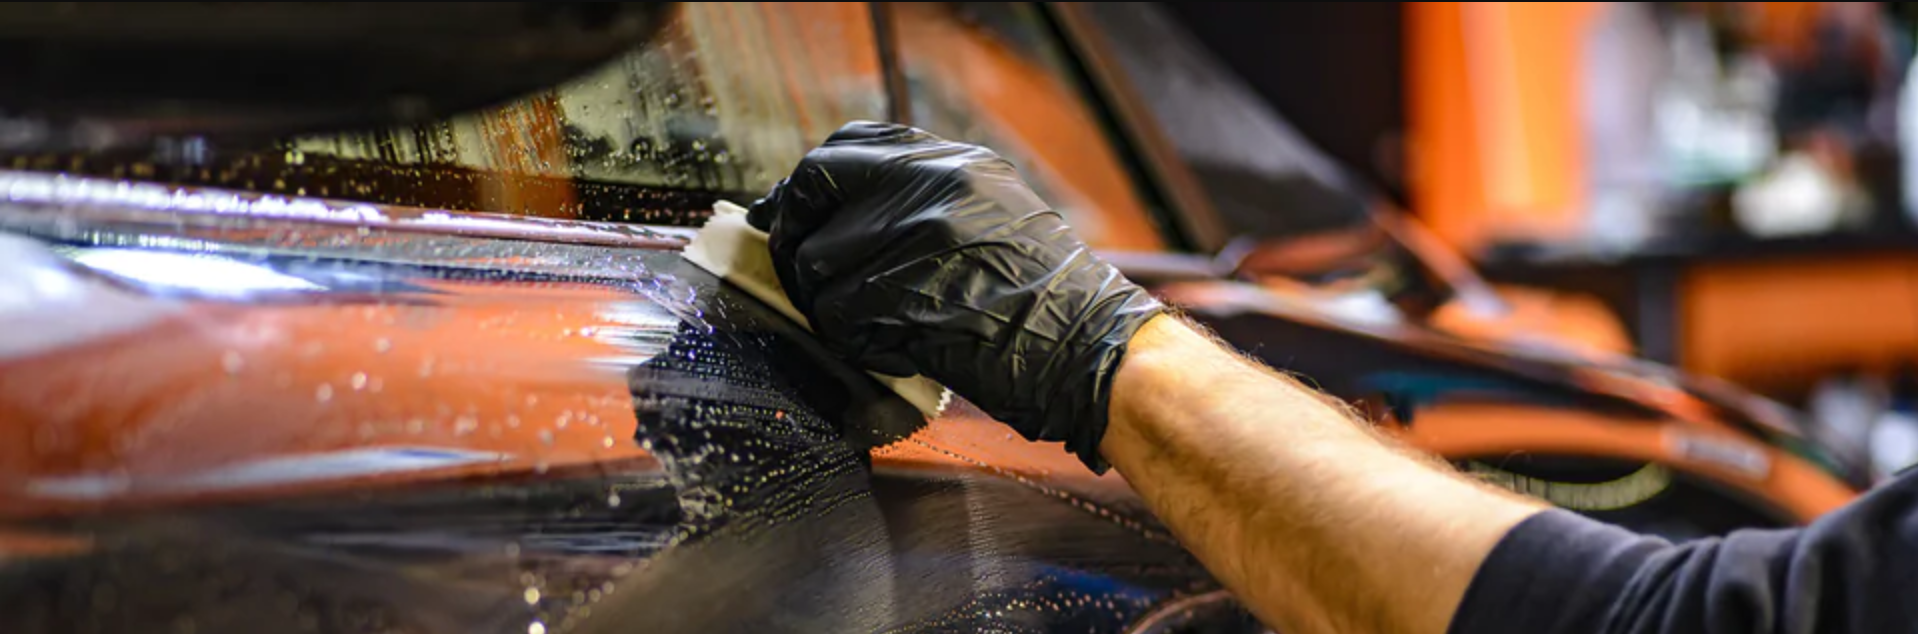 Professional Auto Detailing in Winston-Salem NC